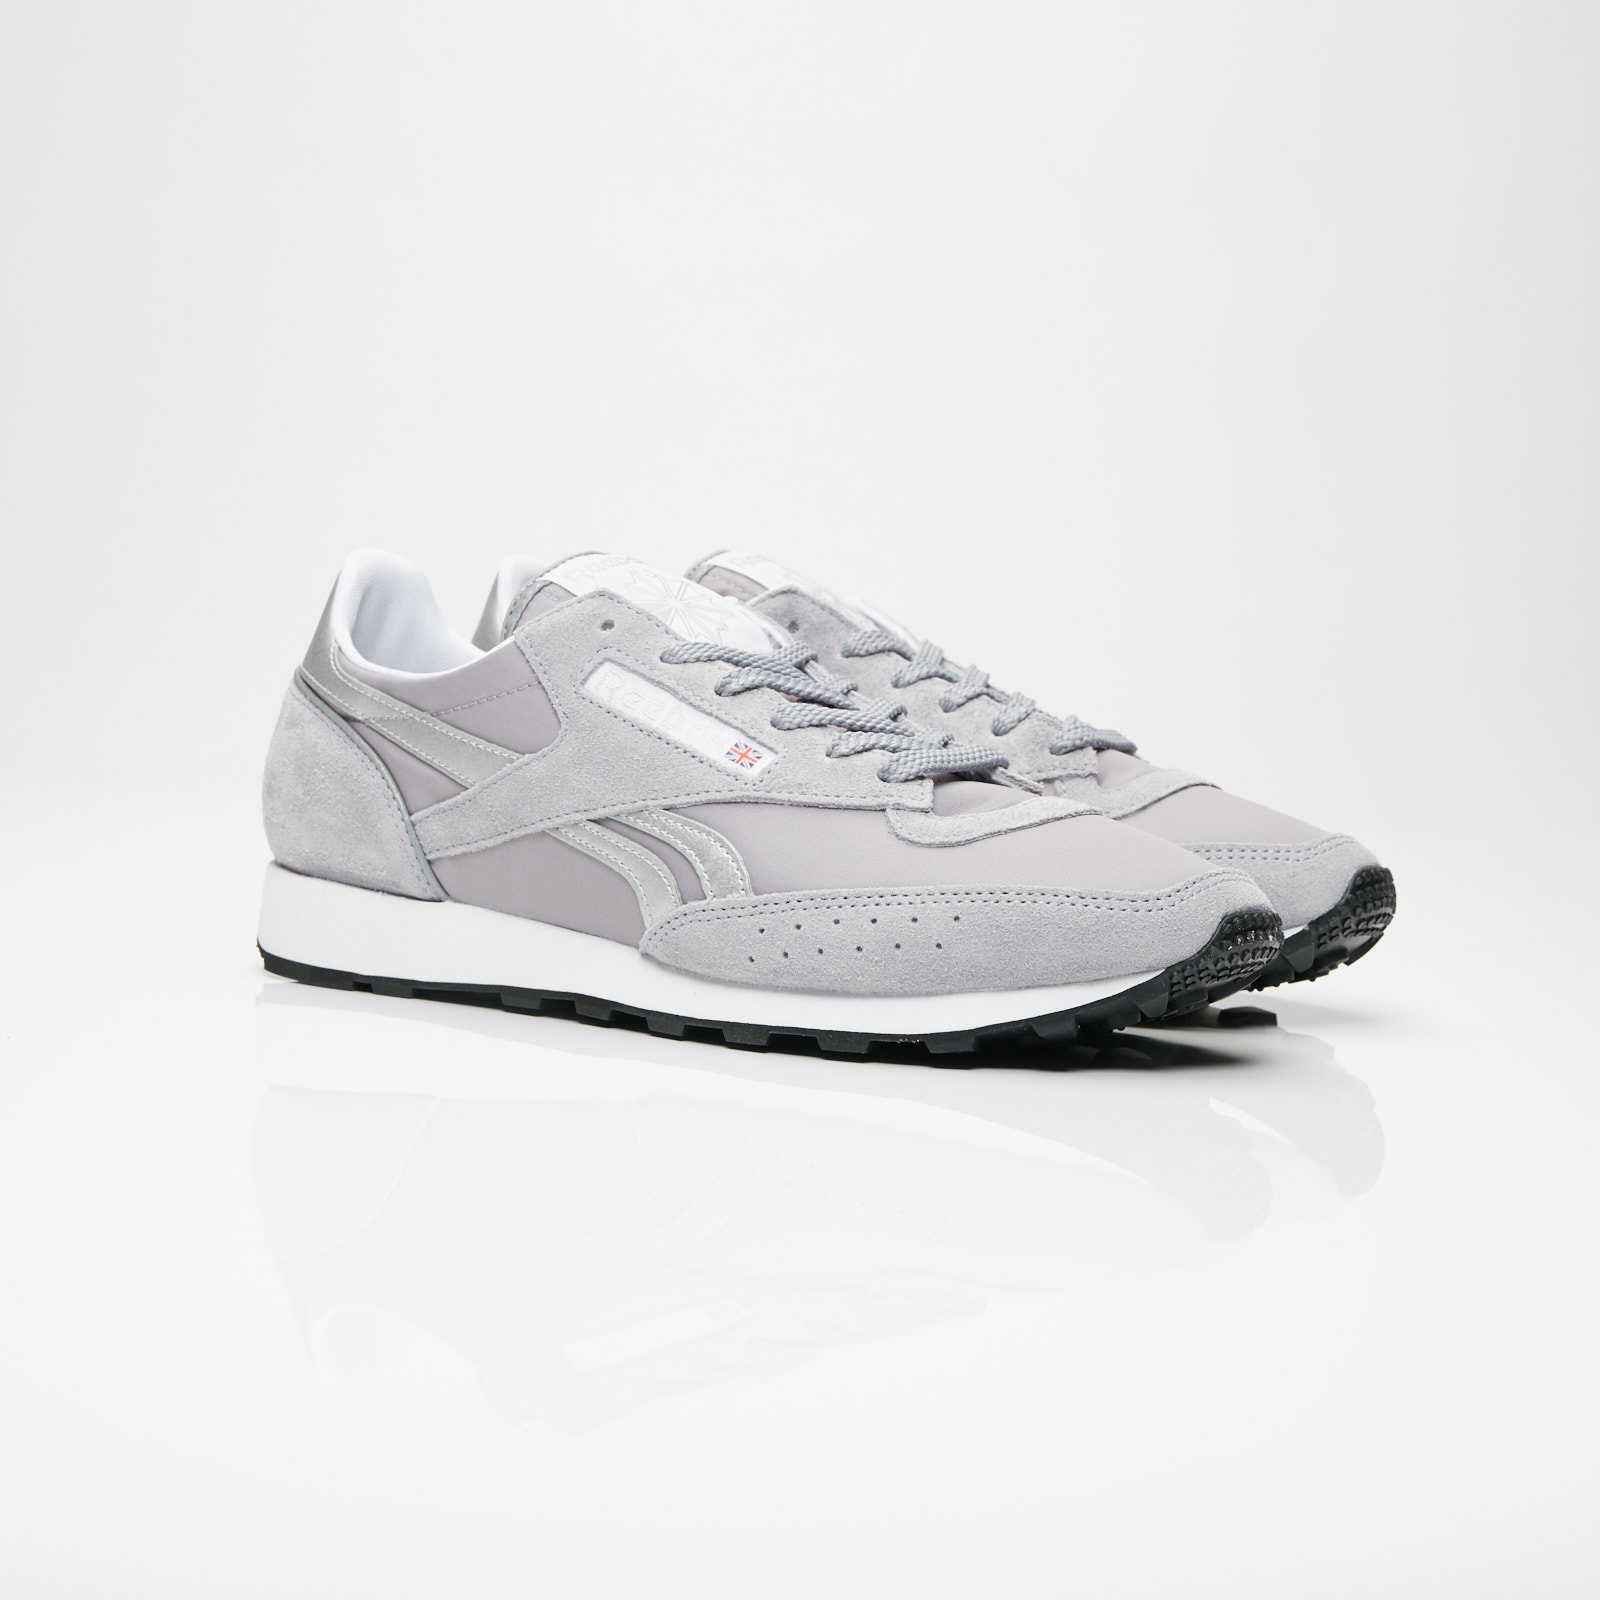 980e2ce49b47 Reebok Classic 83 - Cn3595 - Sneakersnstuff